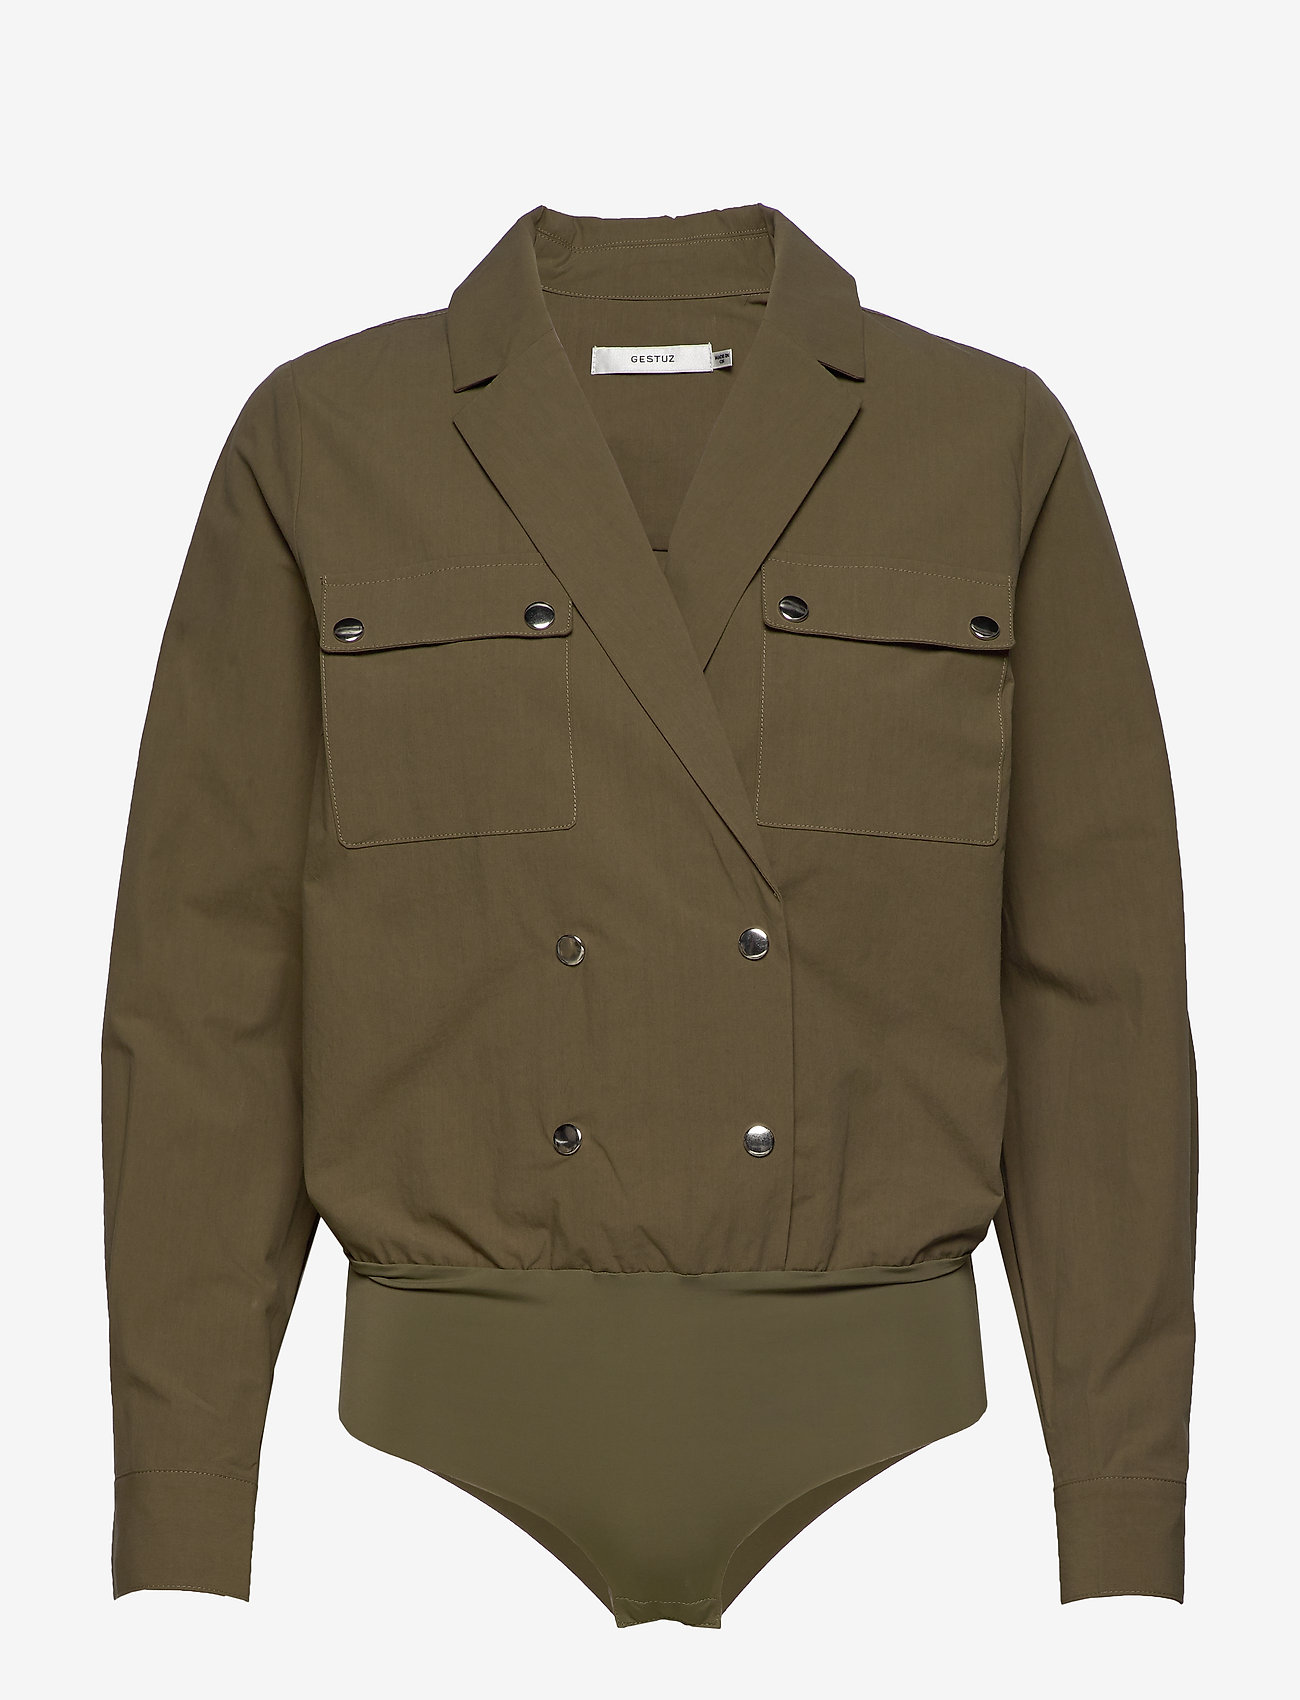 Gestuz - AdalineGZ shirt body MS20 - body - capers - 0